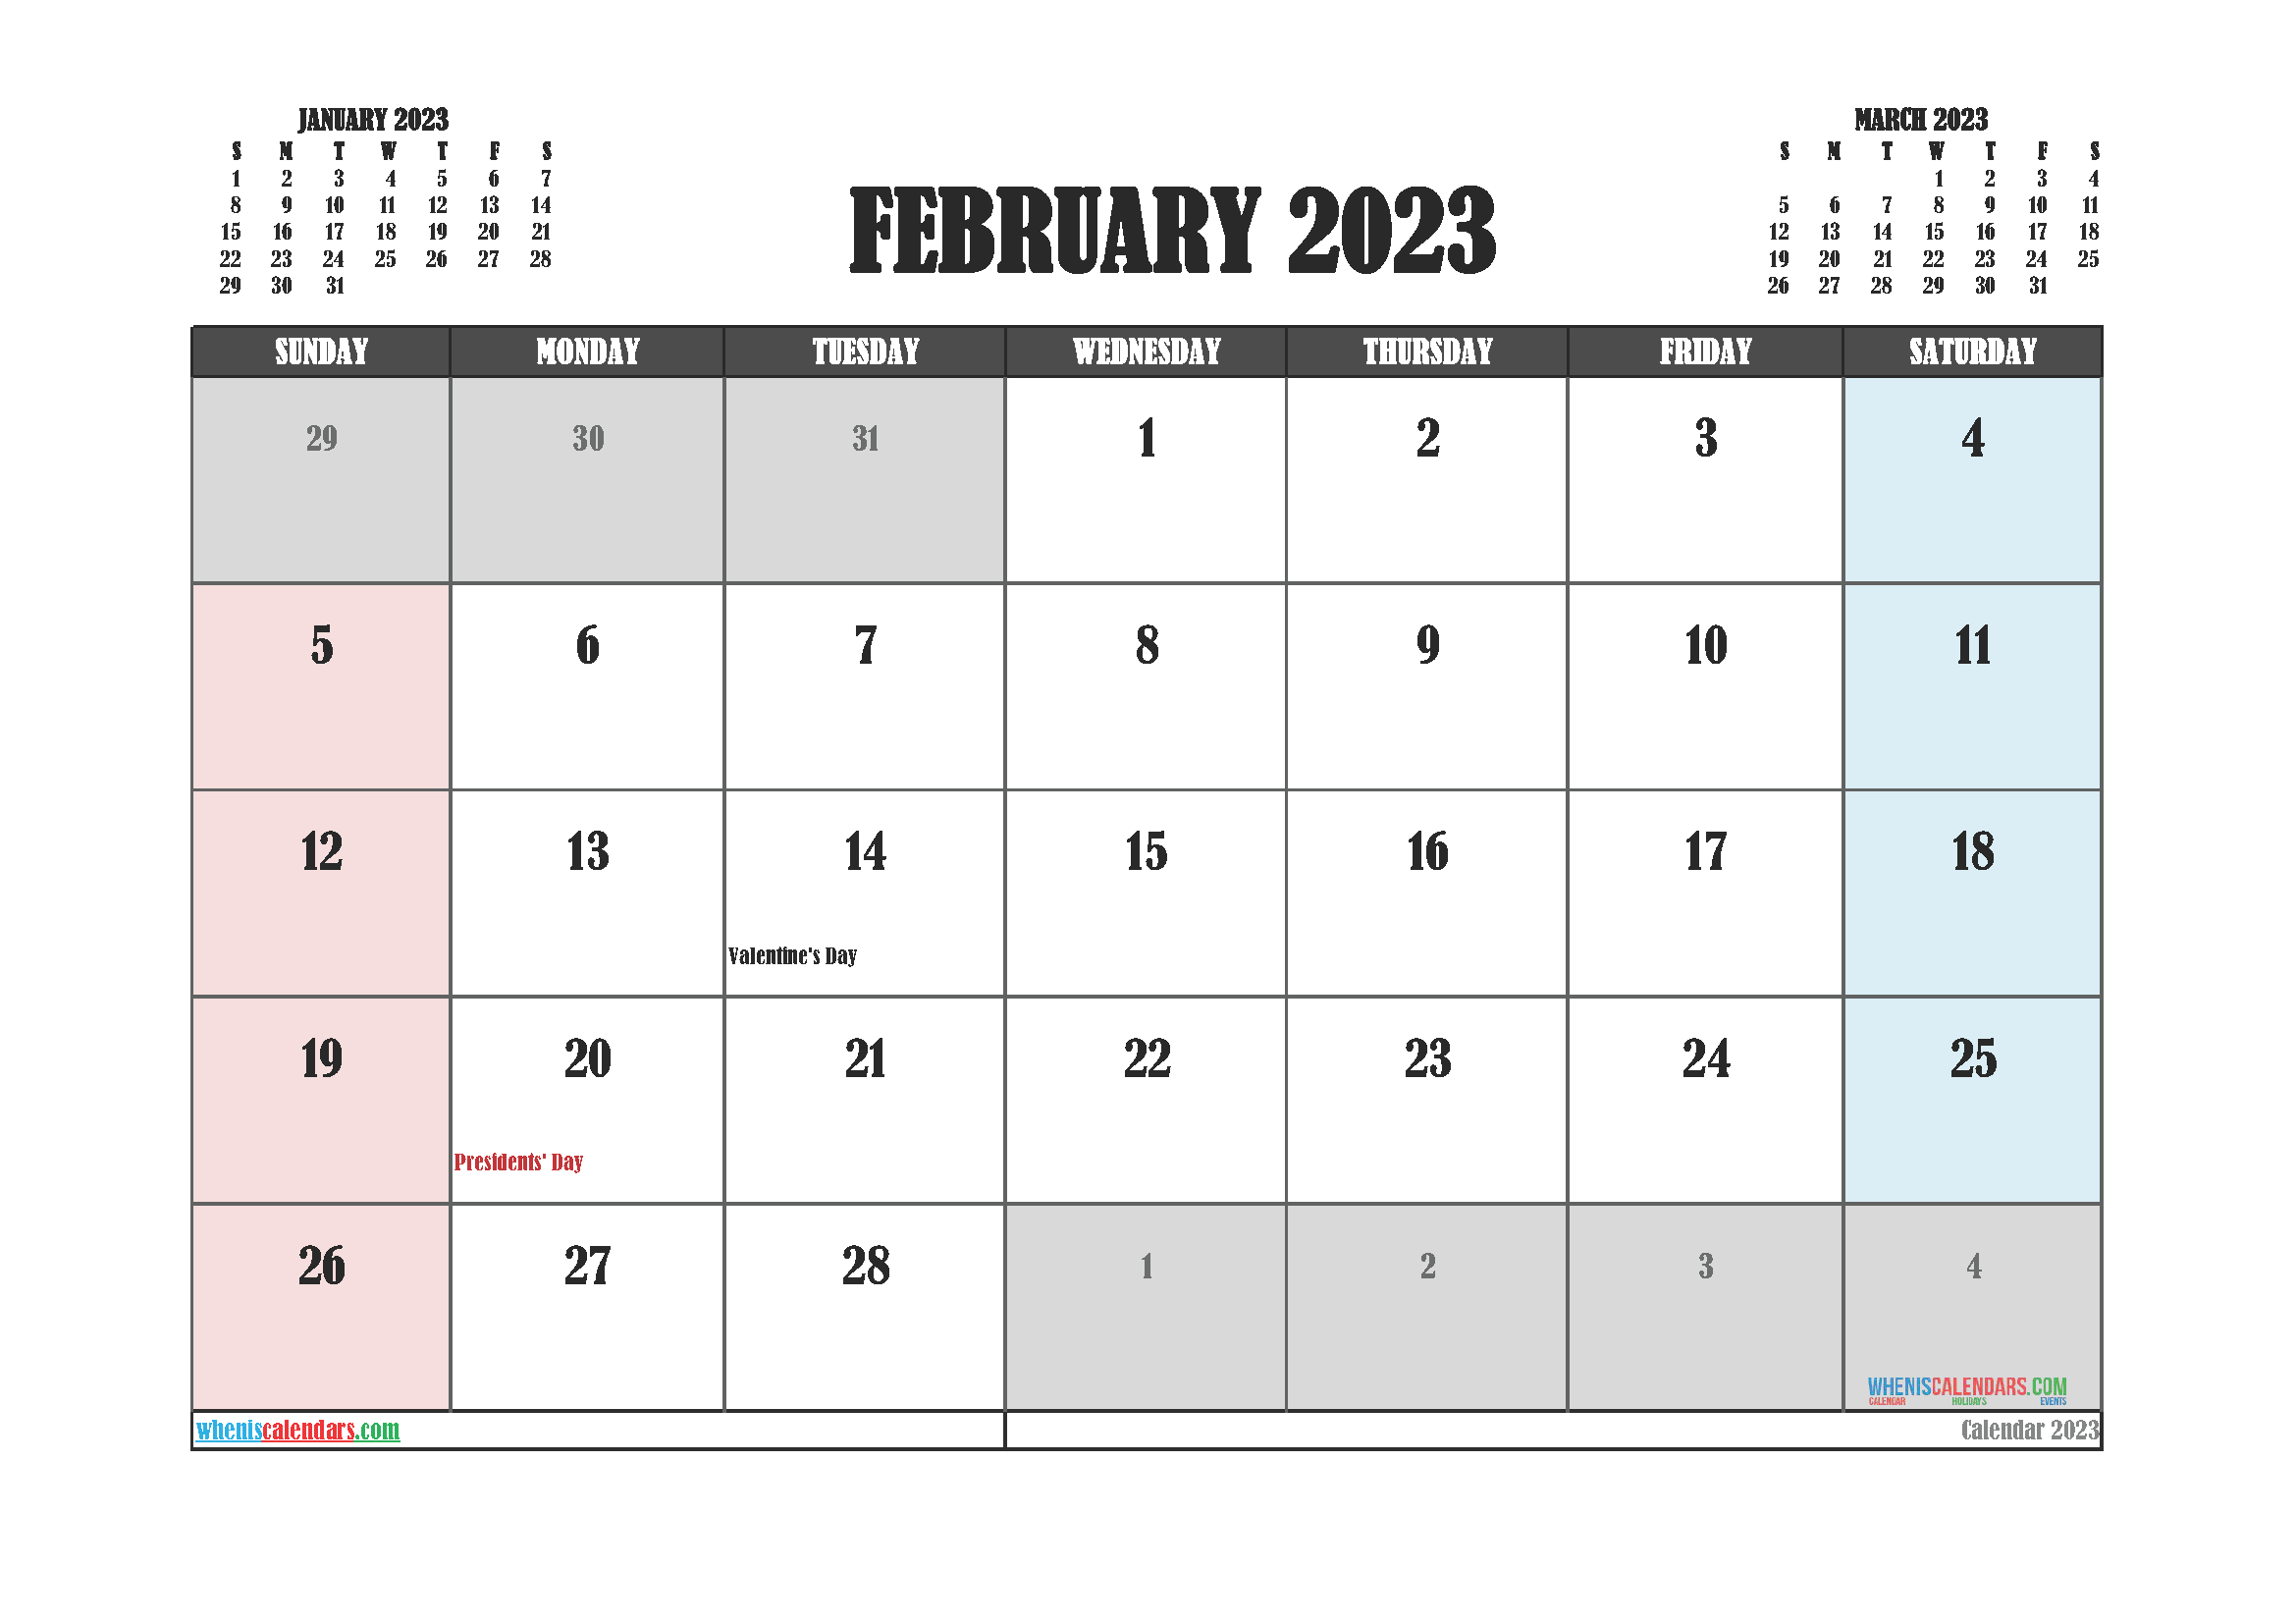 February 2023 Calendar Printable For Free